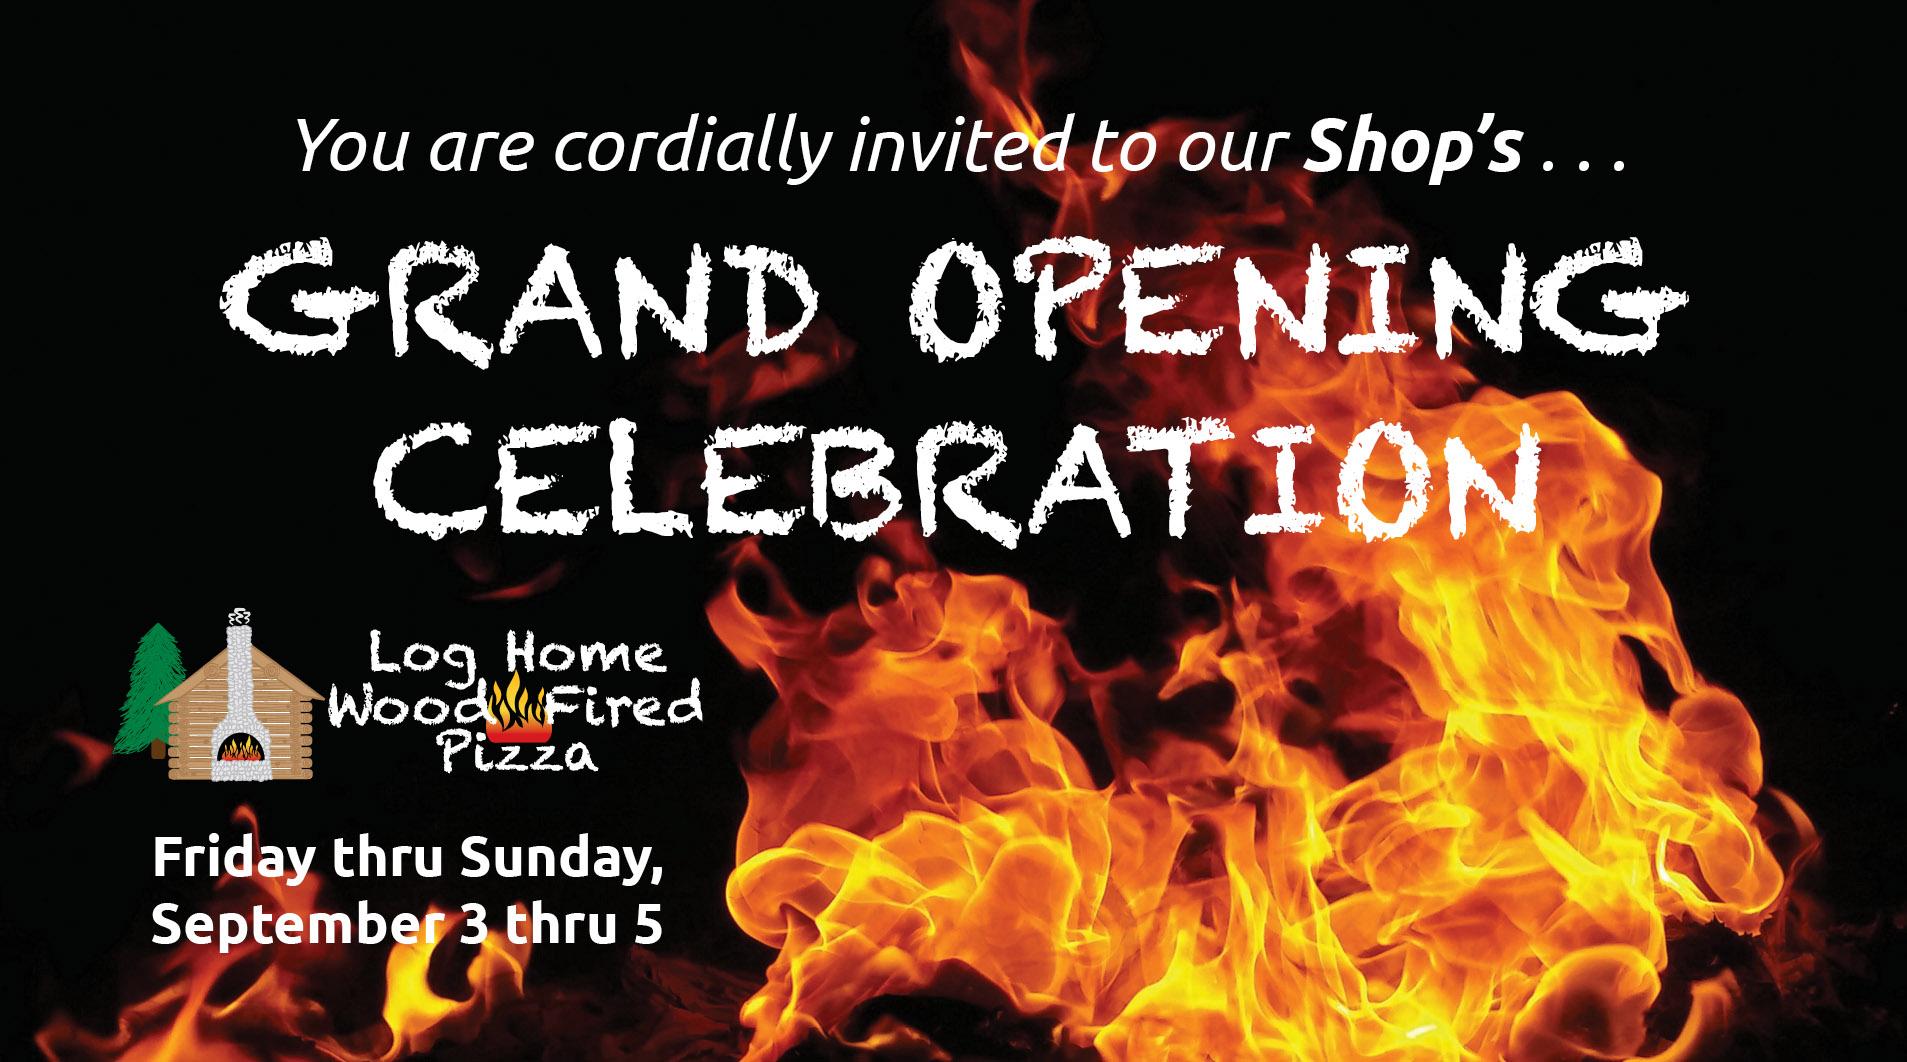 Log Home Wood Fired Pizza Grand Opening Celebration, McGregor, MN